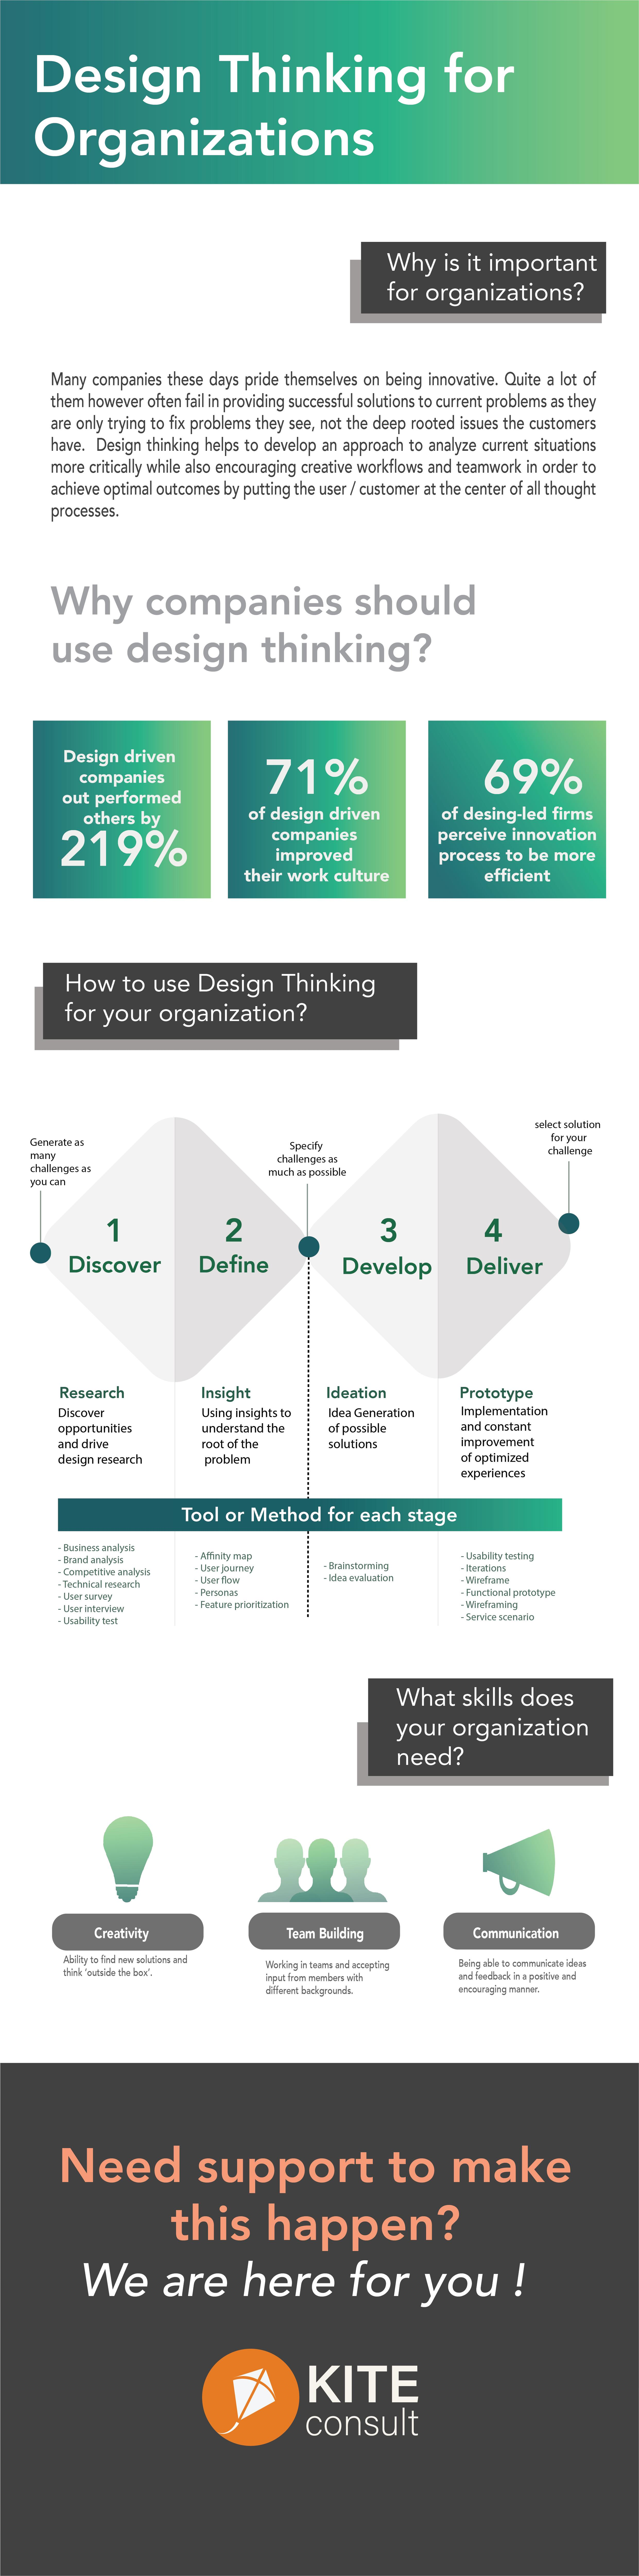 design thinking for organizations